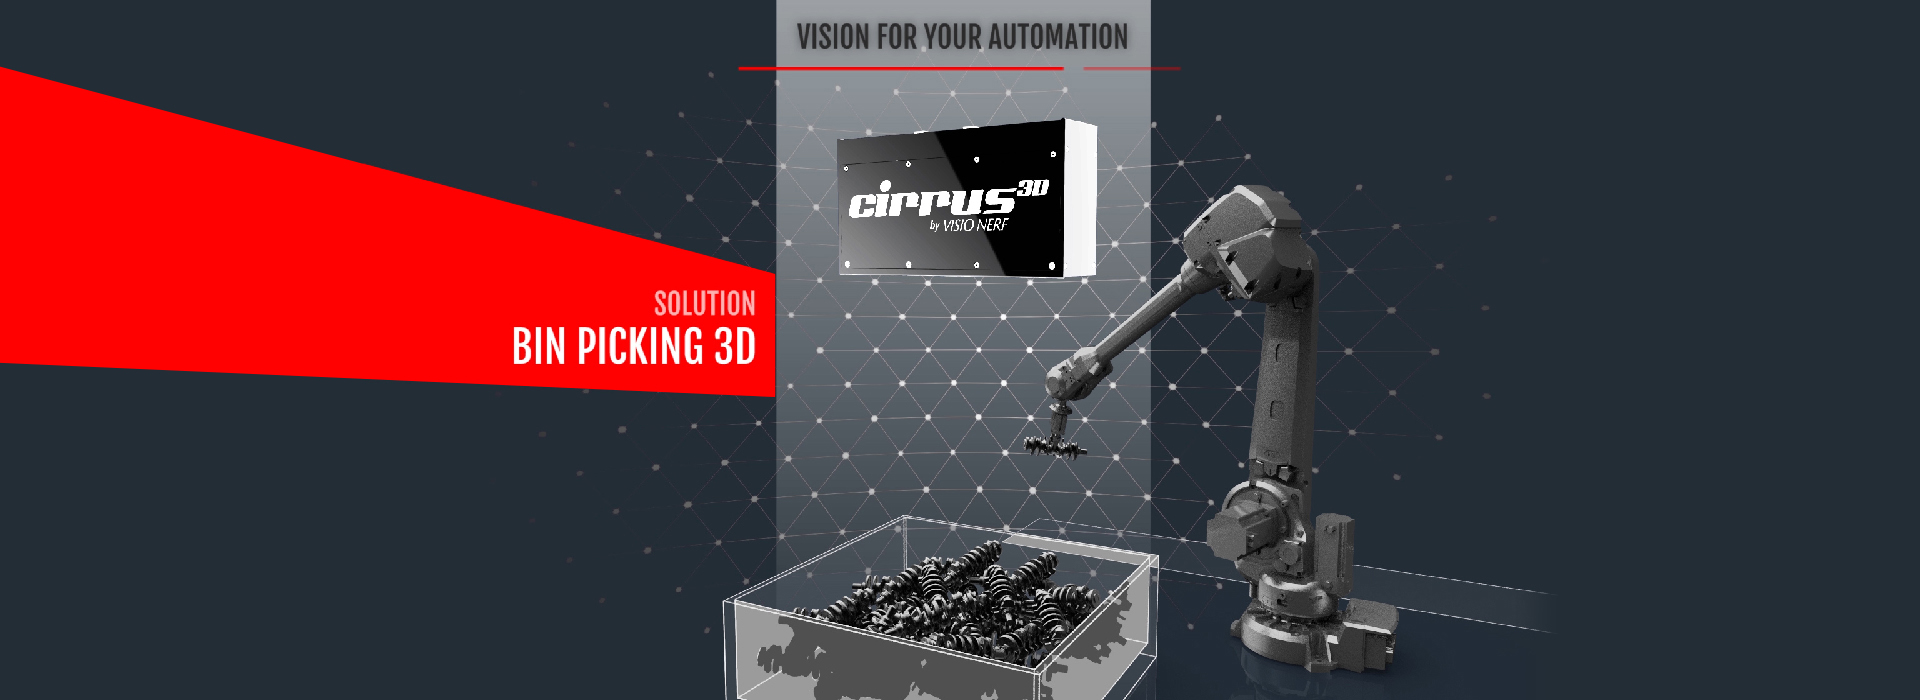 VISIO NERF - 3D Bin Picking